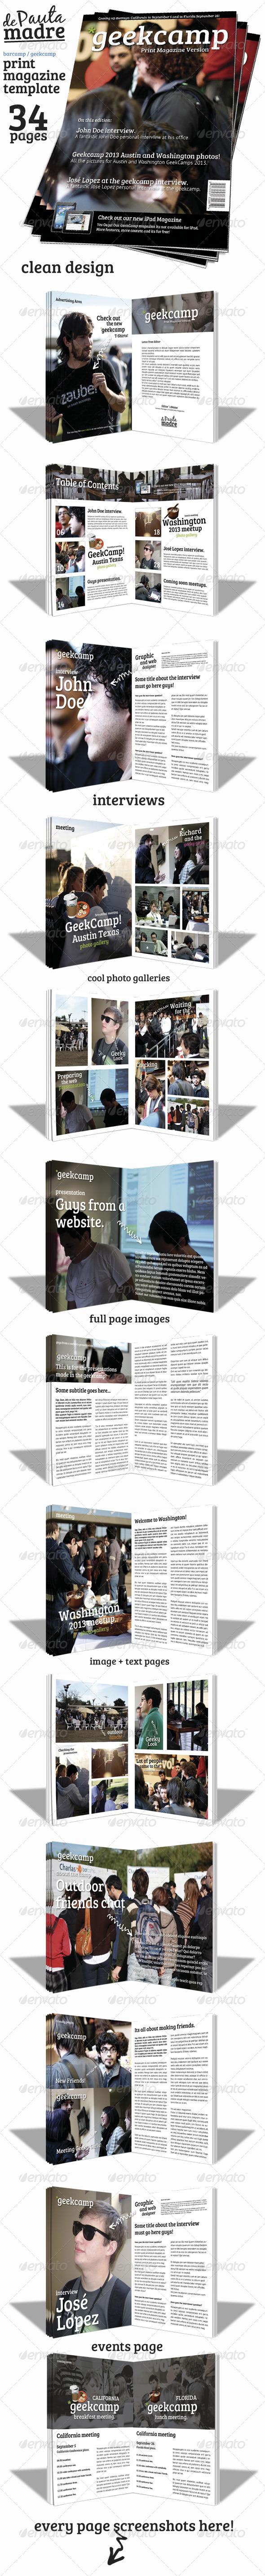 Barcamp-Geekcamp Magazine Template - Magazines Print Templates